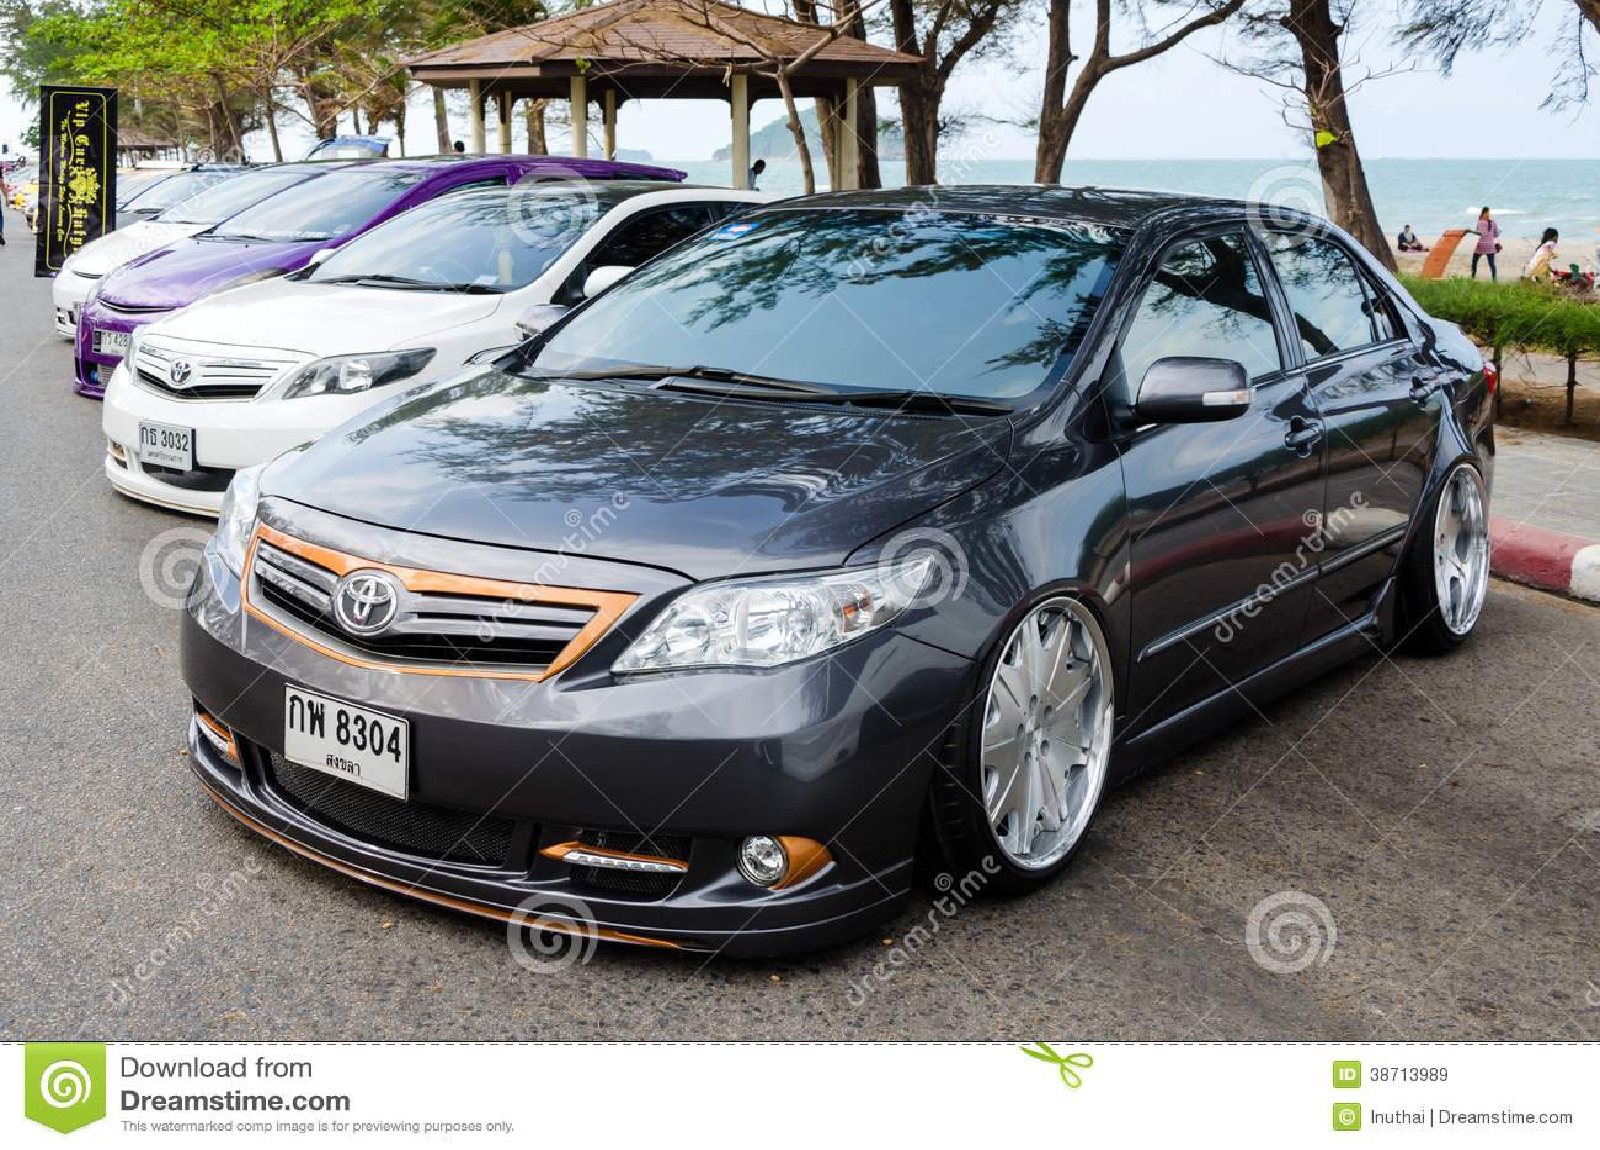 Tuned Car Toyota Corolla Altis Editorial Stock Image